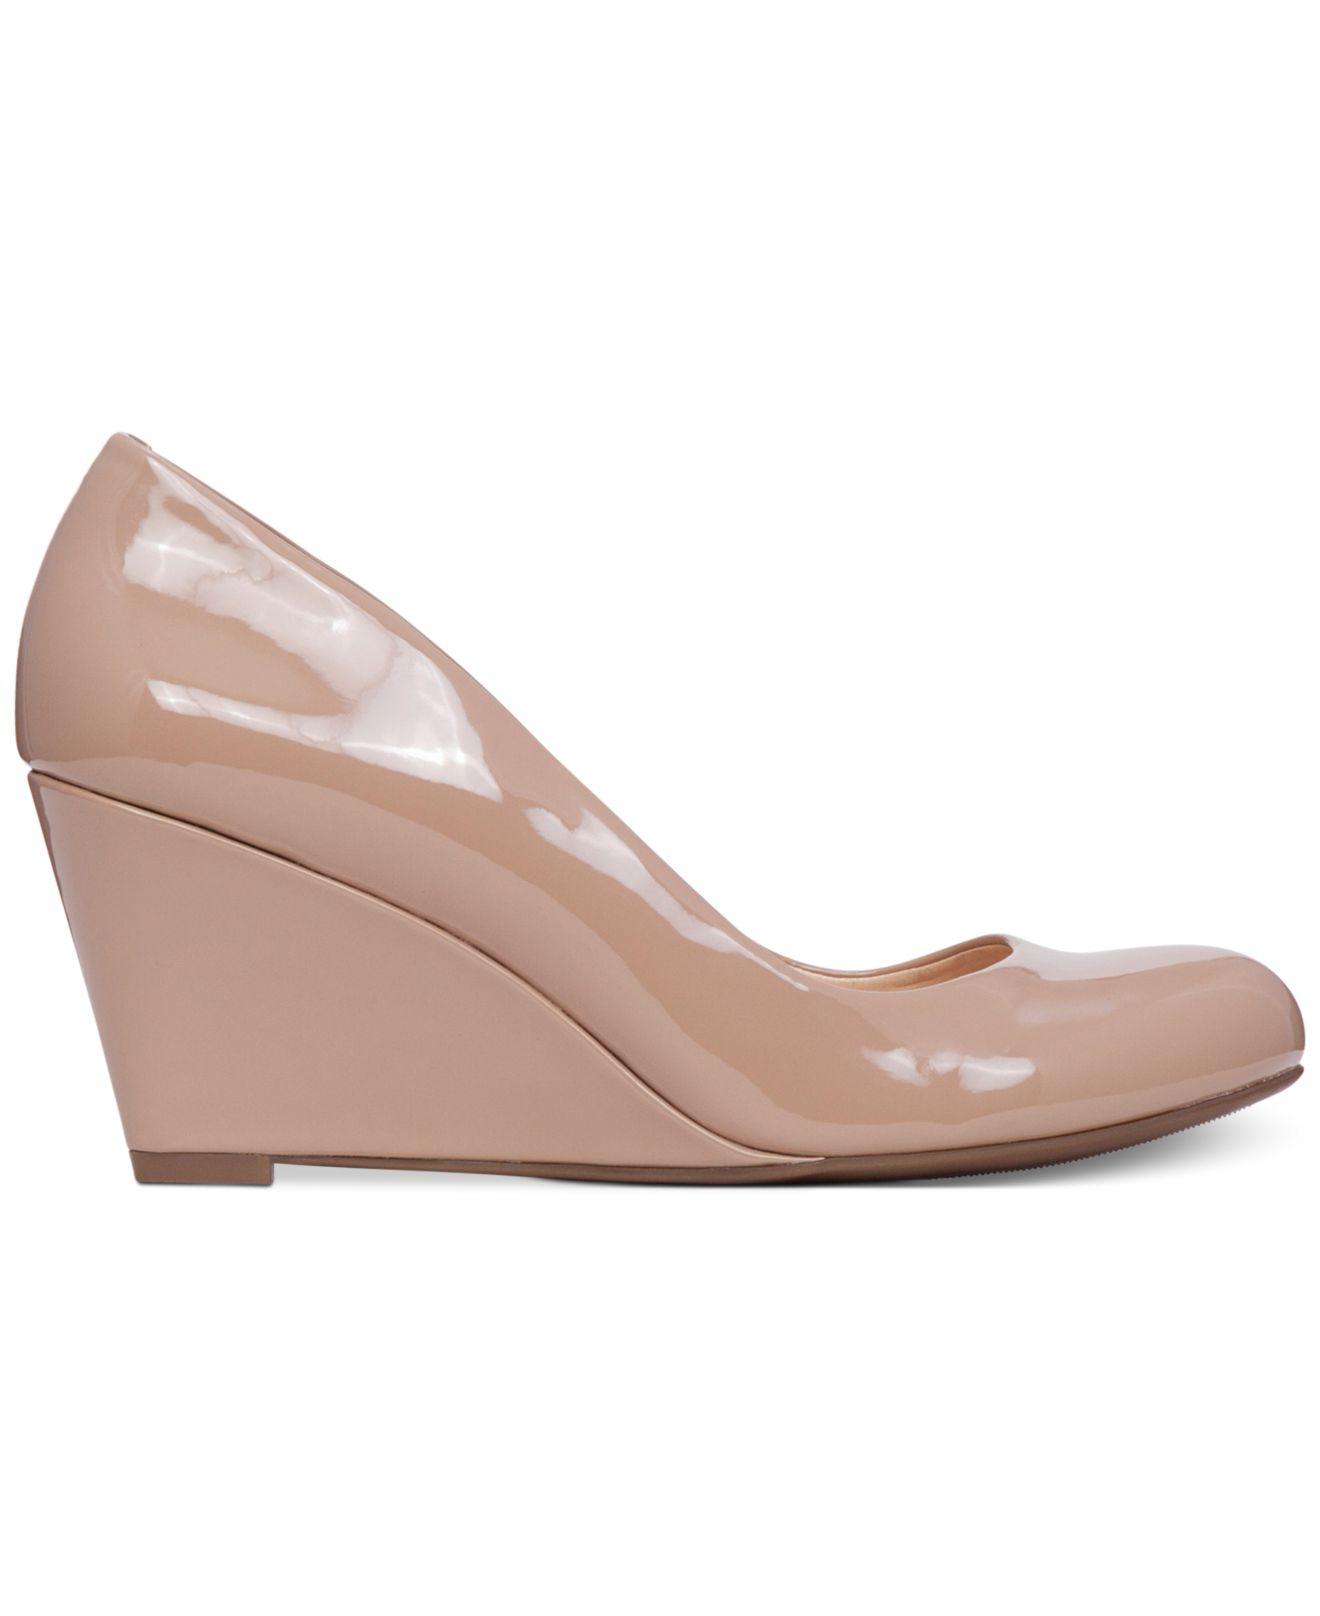 Nude Round Toe Heels